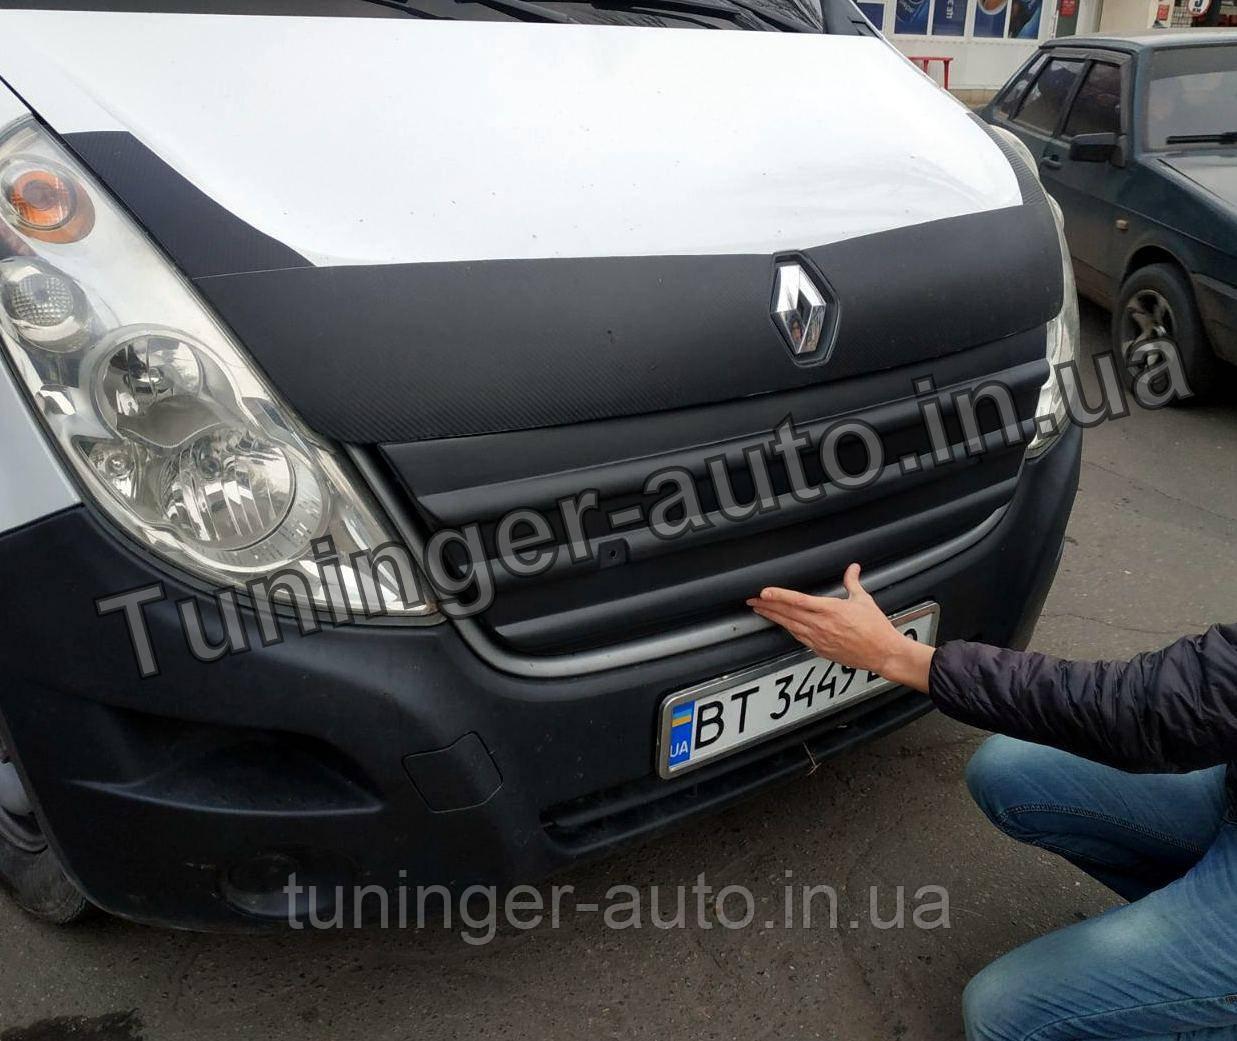 Зимняя накладка на решетку Renault Master 2010-2014г.в. (FLY)